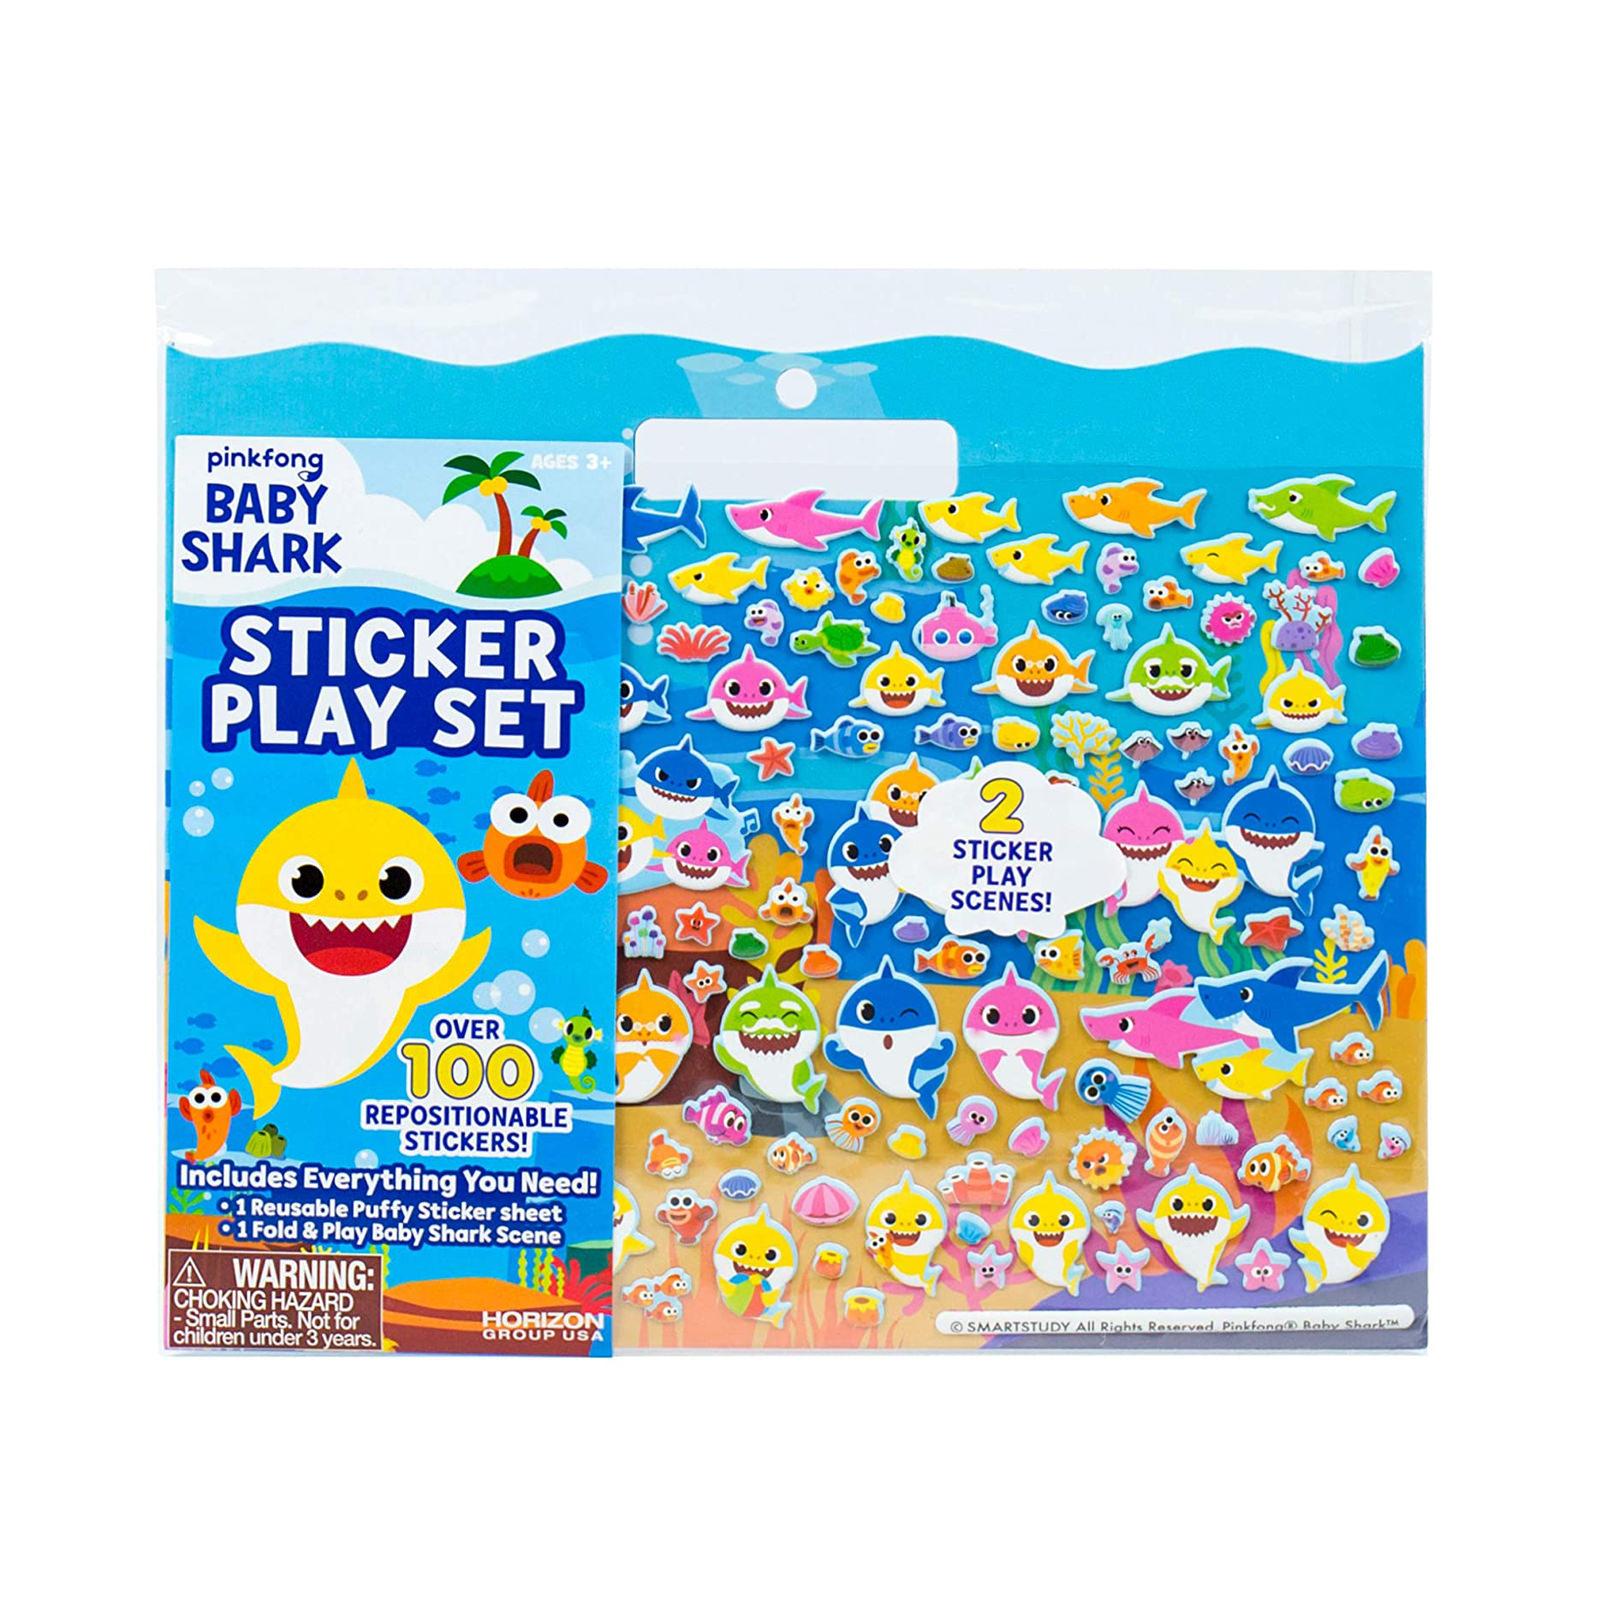 Baby Shark Sticker Play Scene Activity Set at Toys R Us